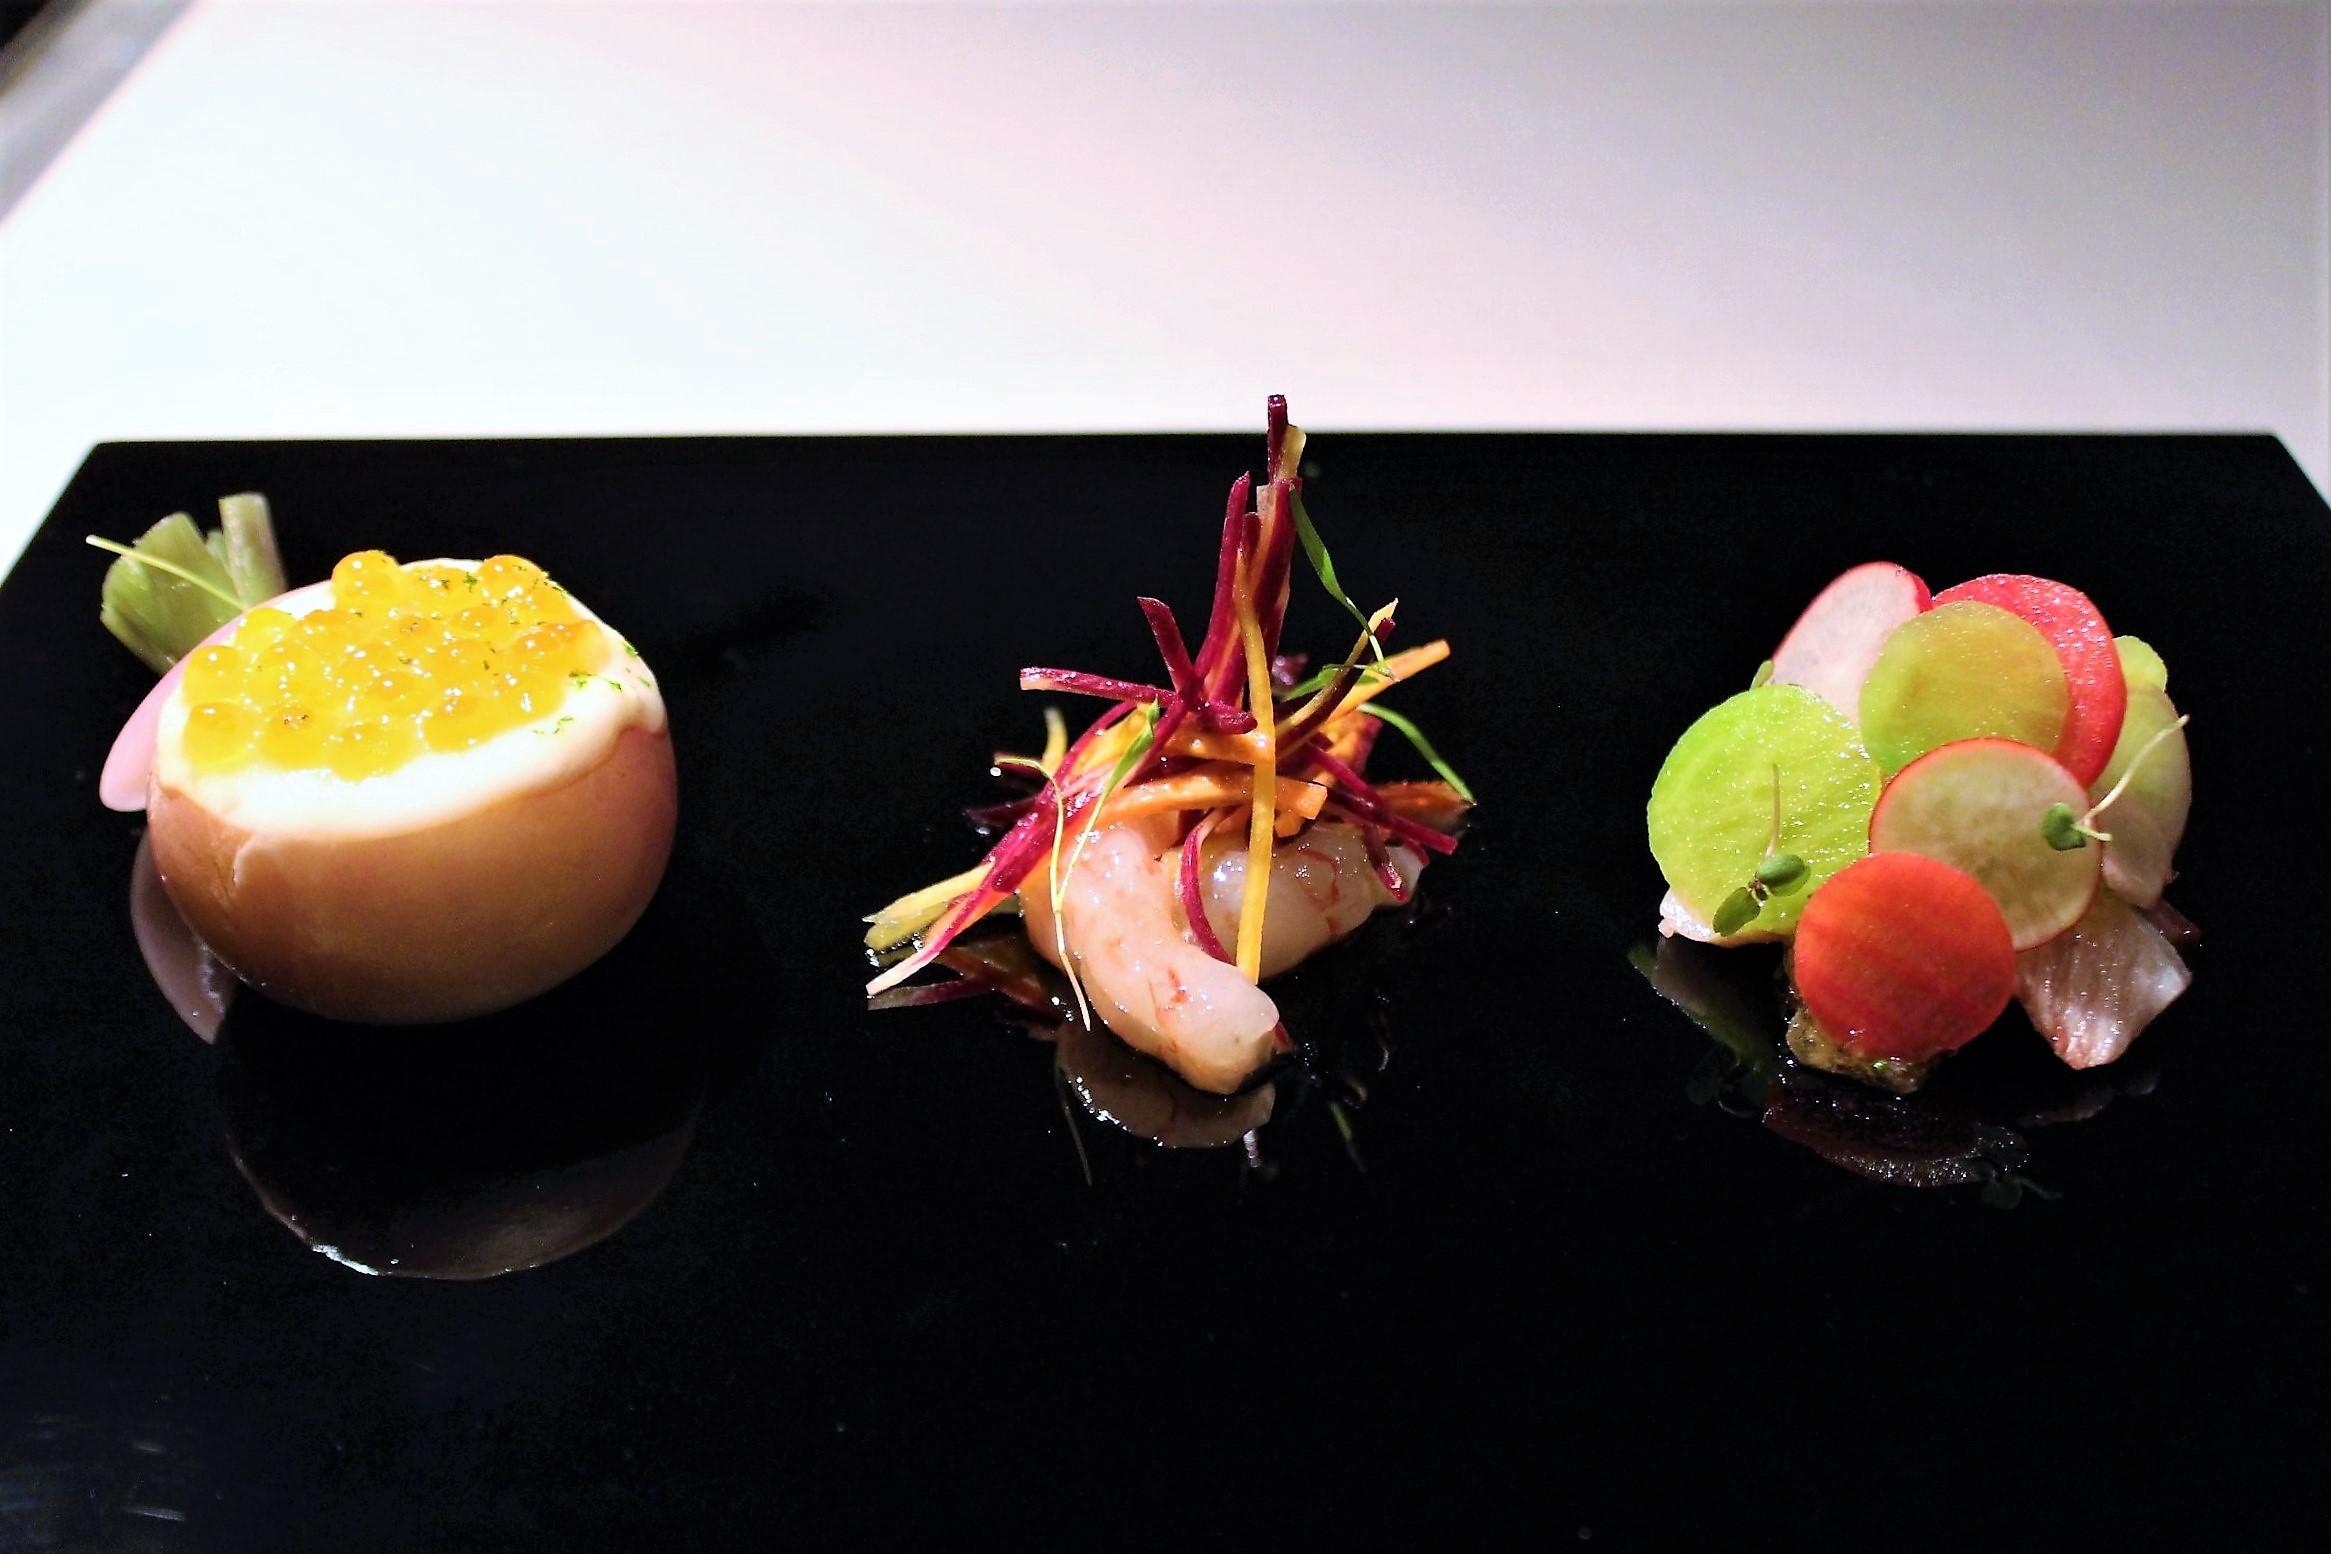 Yellow Tail, Wasabi, Botan Shrimp, Salmon Roe, Hairy Crab at Narisawa in Tokyo, Japan